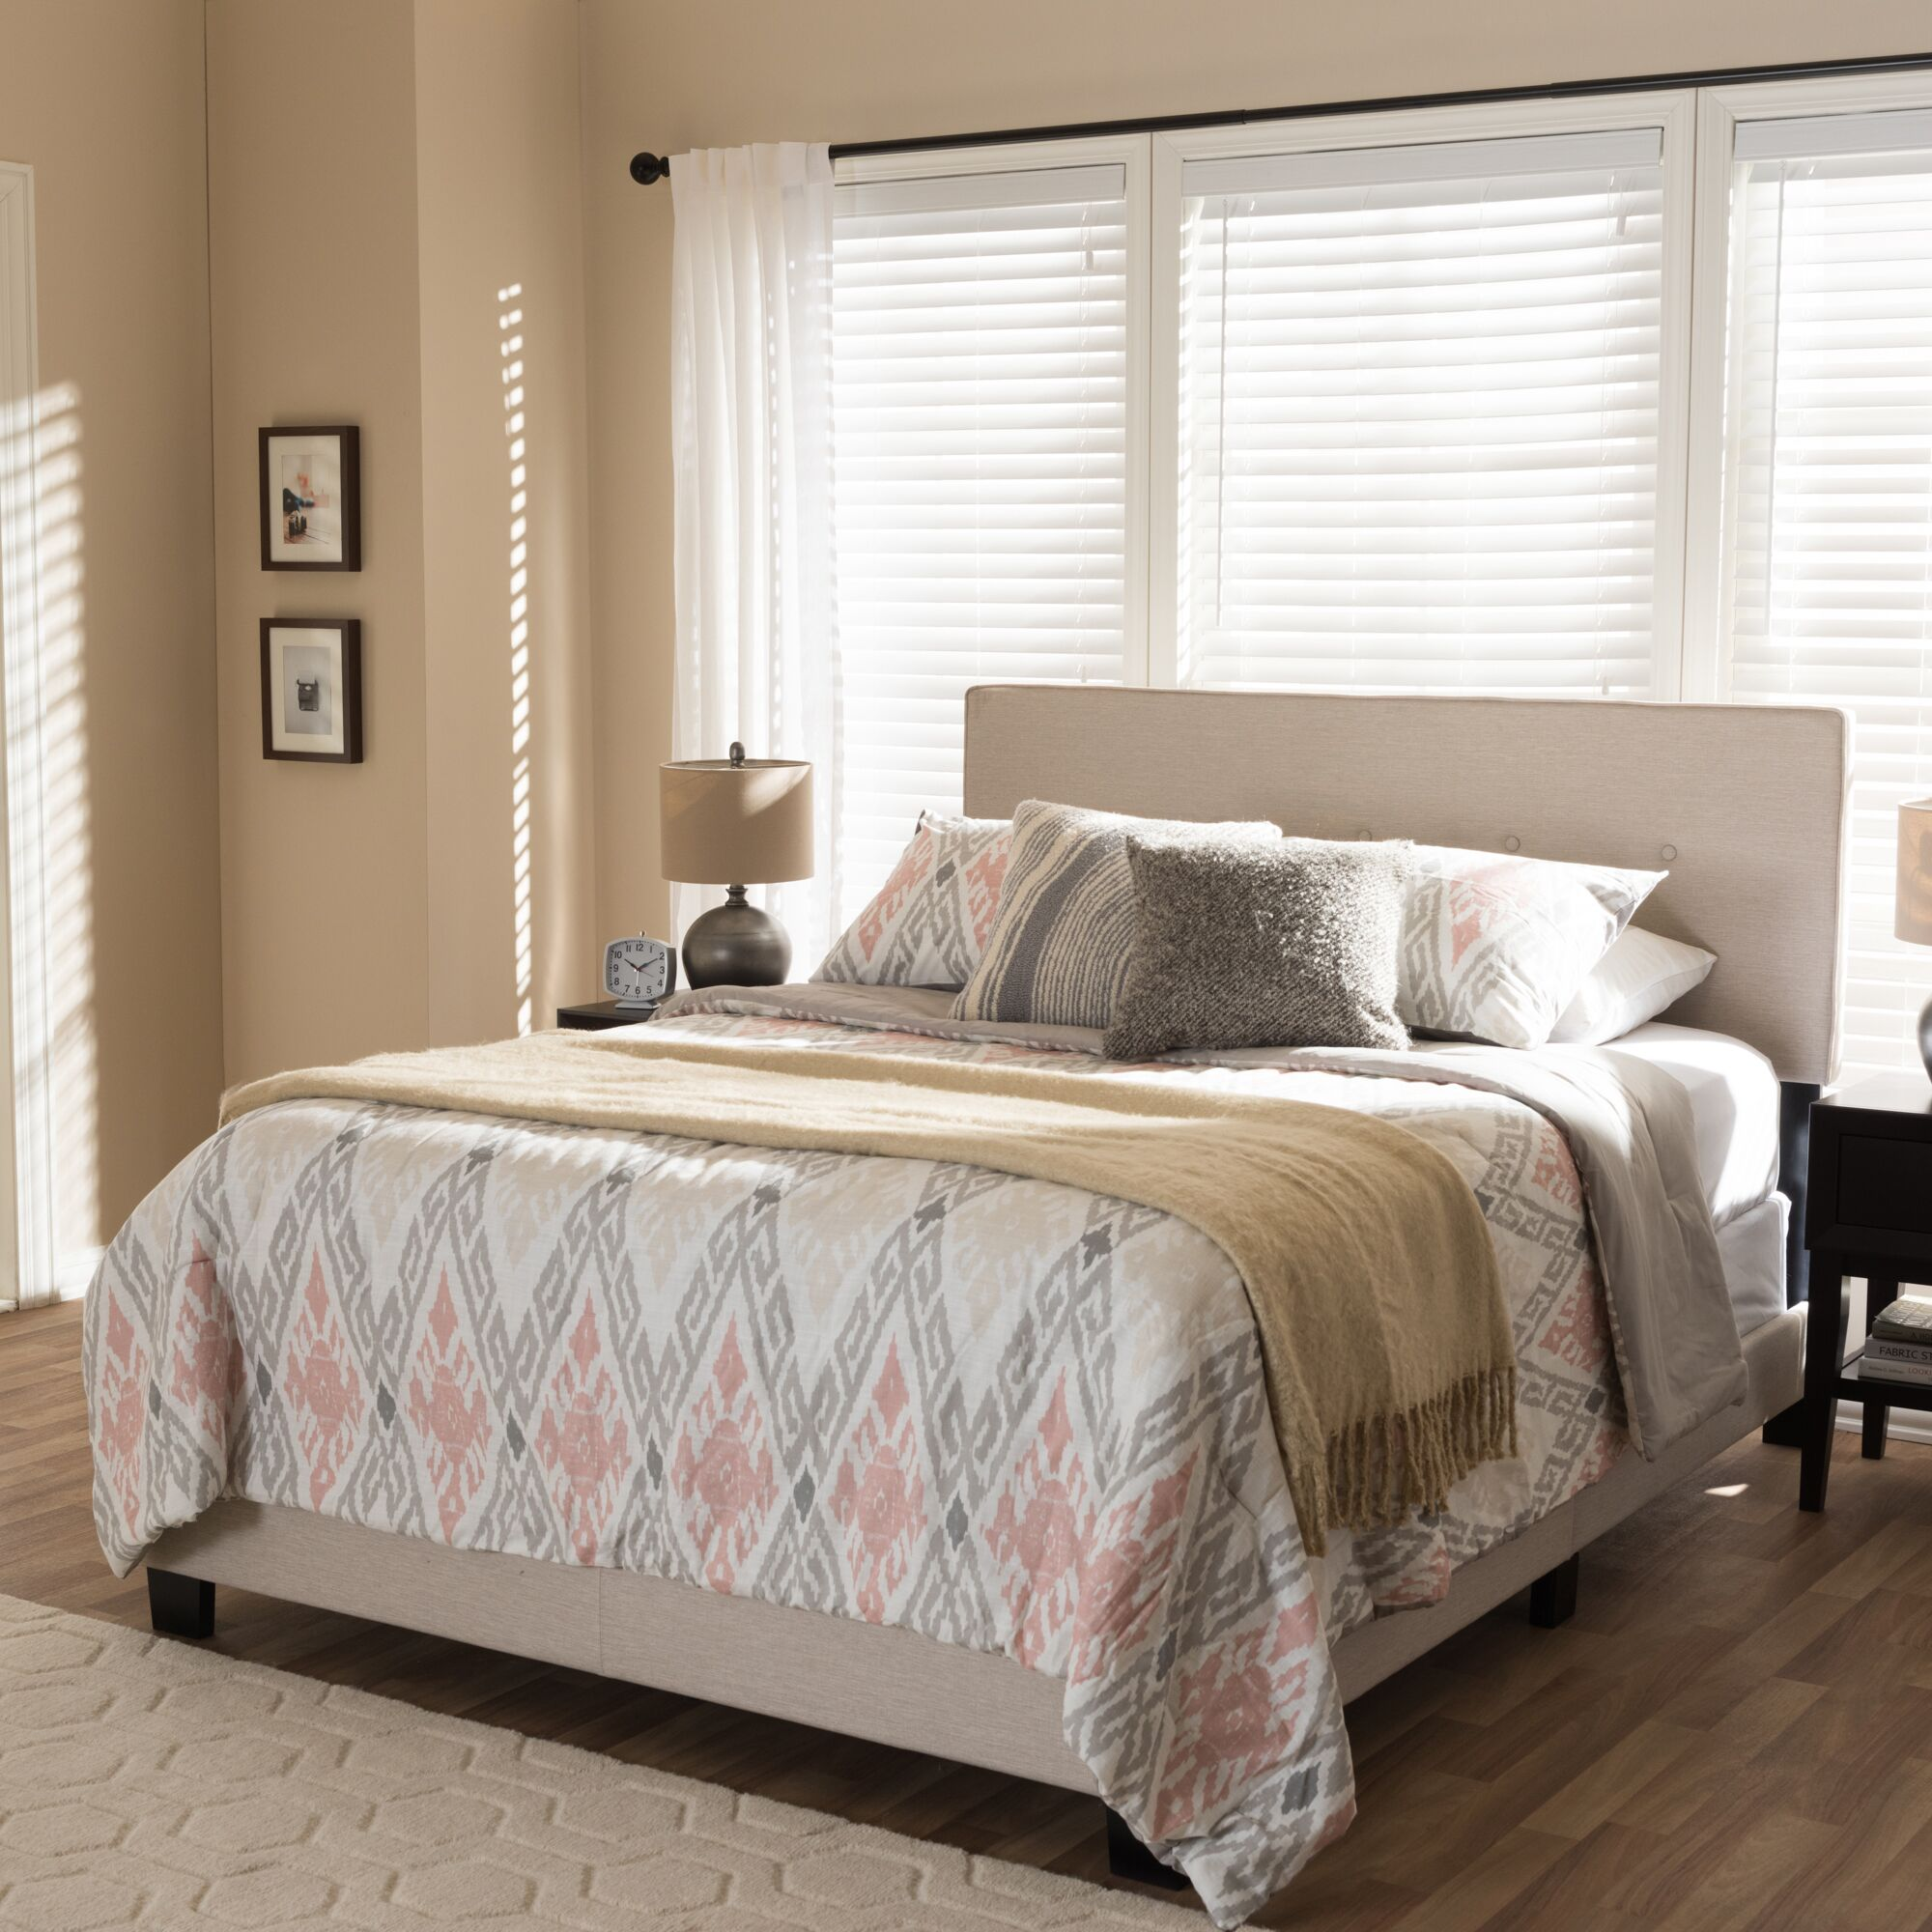 Sampson Fabric Upholstered Panel Bed Size: King, Color: Light Beige